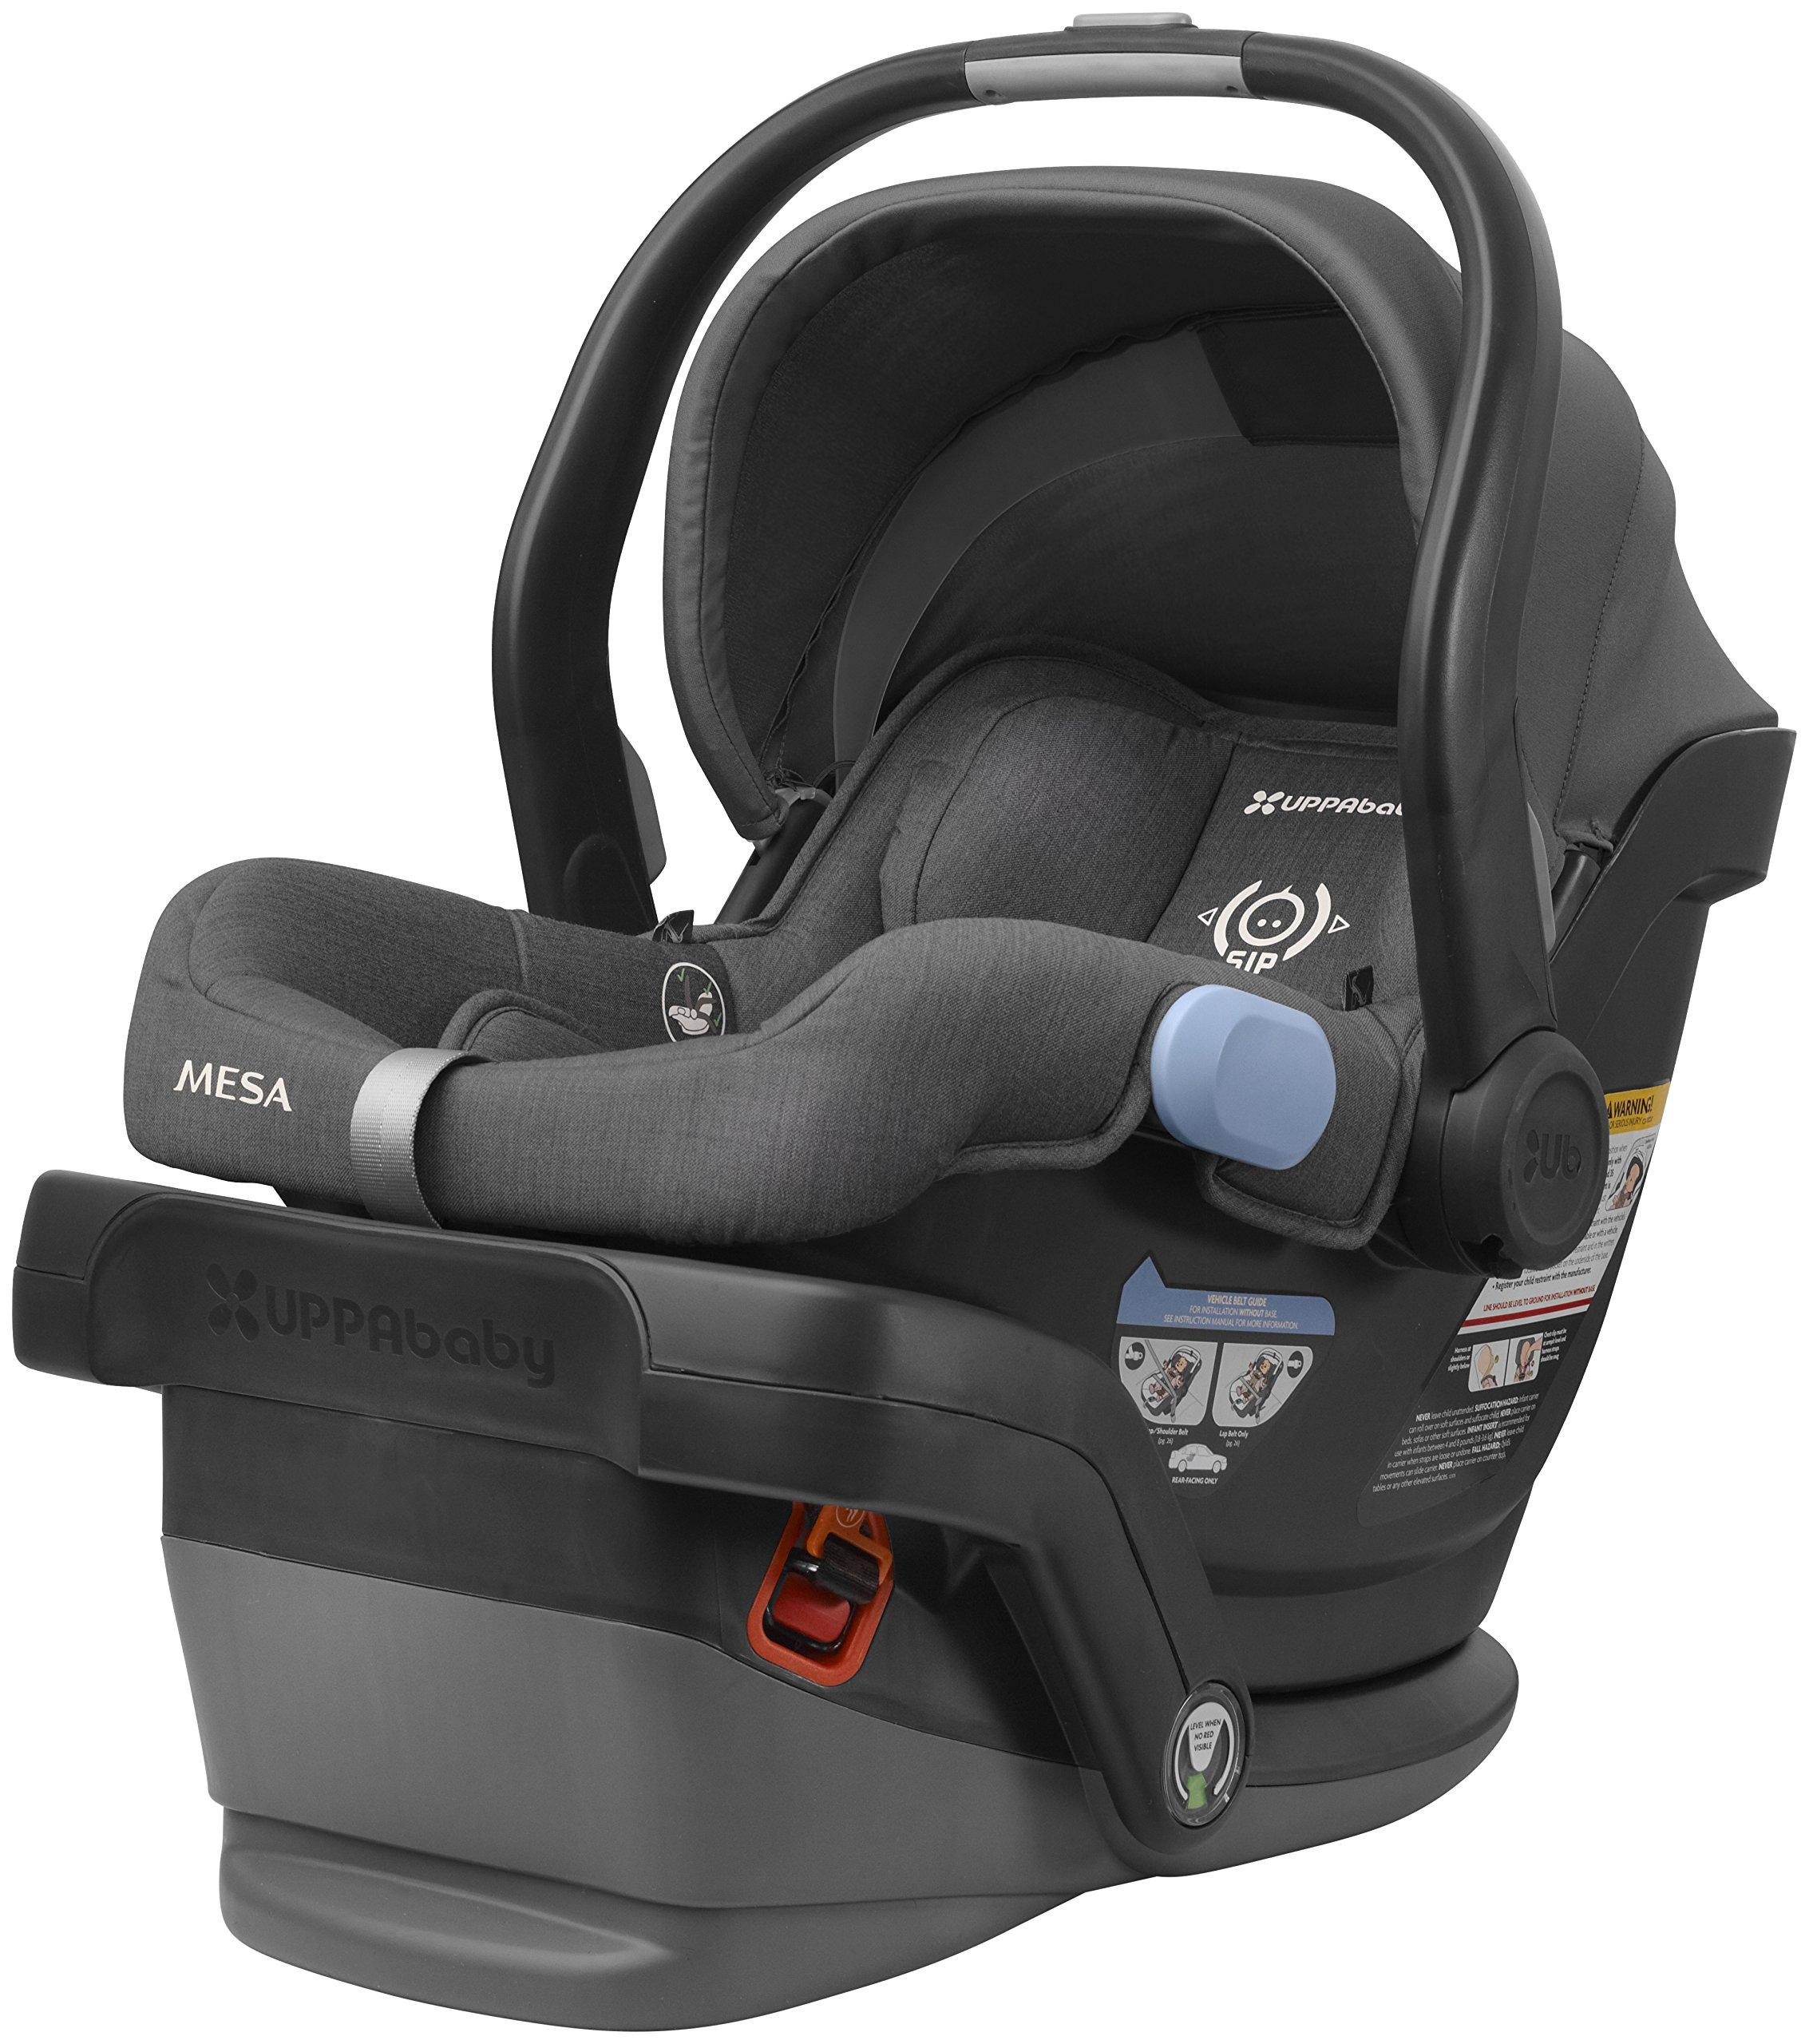 Amazon.com : UPPAbaby MESA Base : Baby